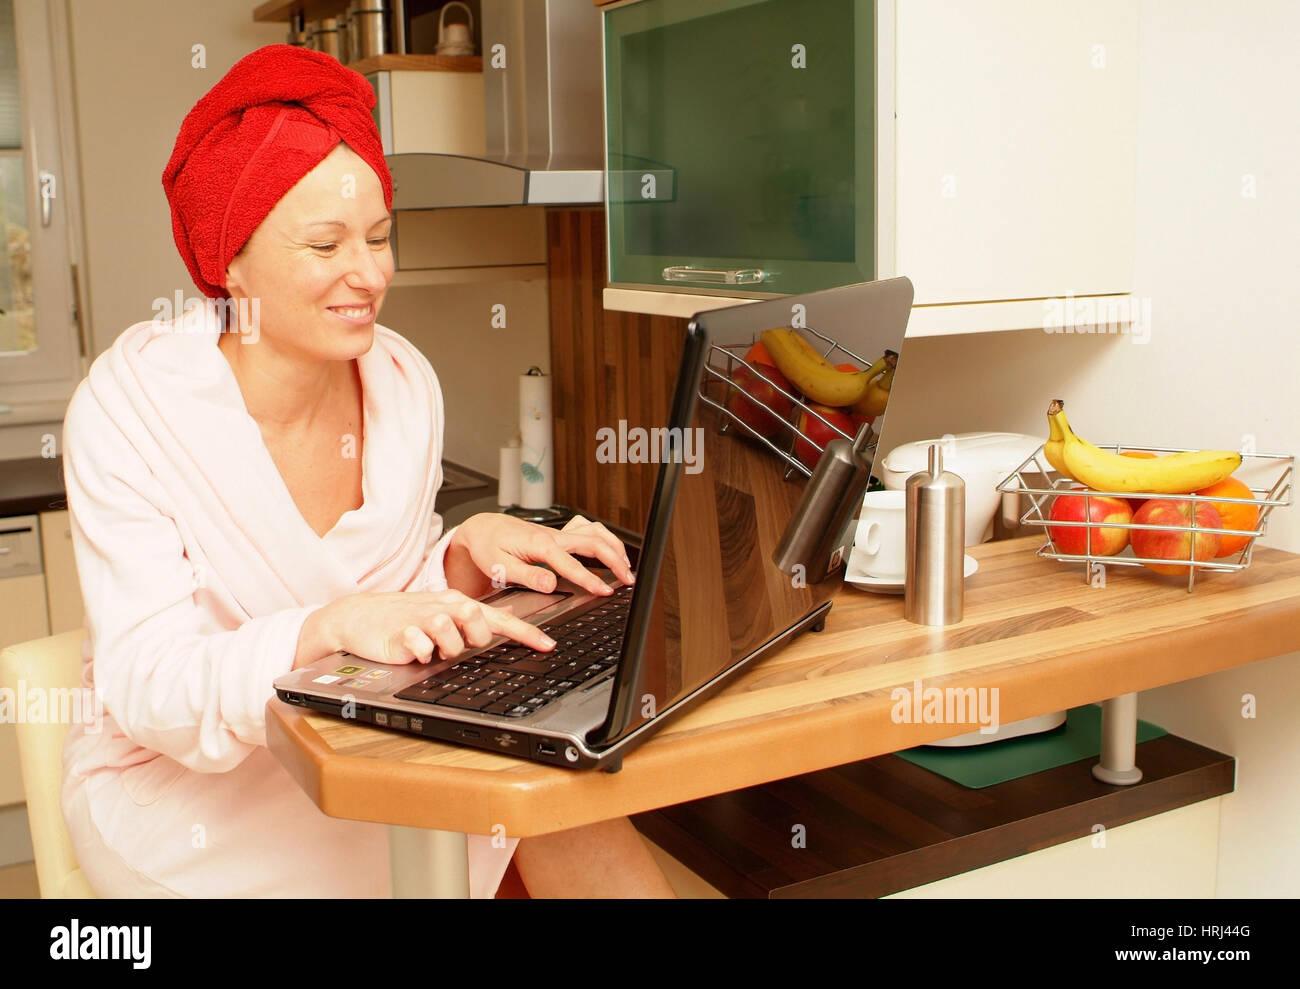 Junge Frau im Morgenmantel arbeitet am Notebook in der K?che - woman in bath robe using laptop in kitchen - Stock Image